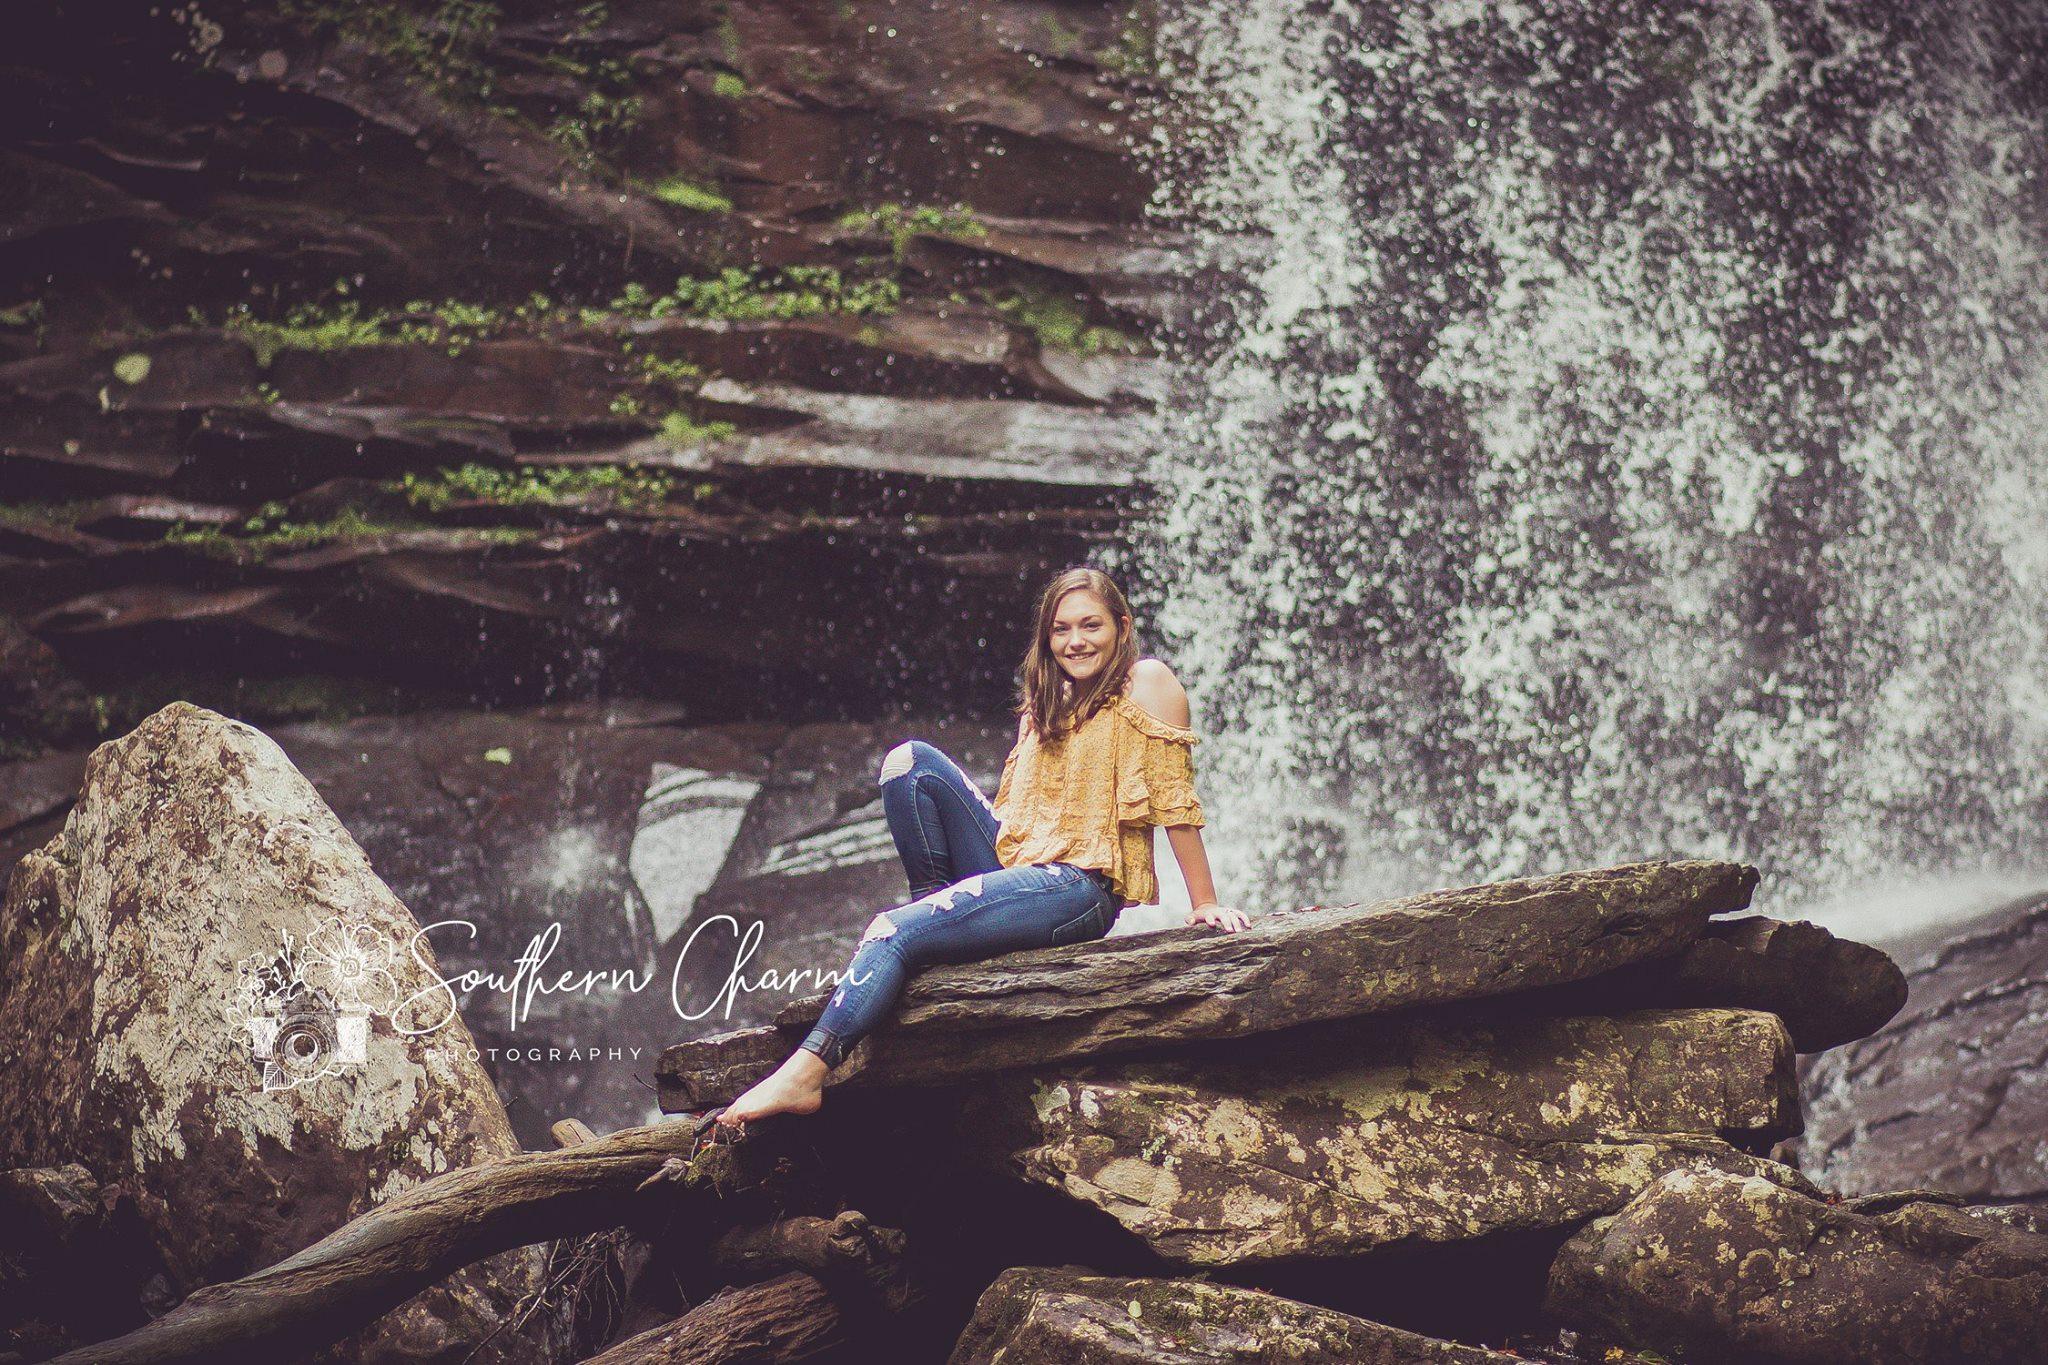 Portrait Photographer - Marlington, West Virginia. USA - Southern Charm Photography LLC